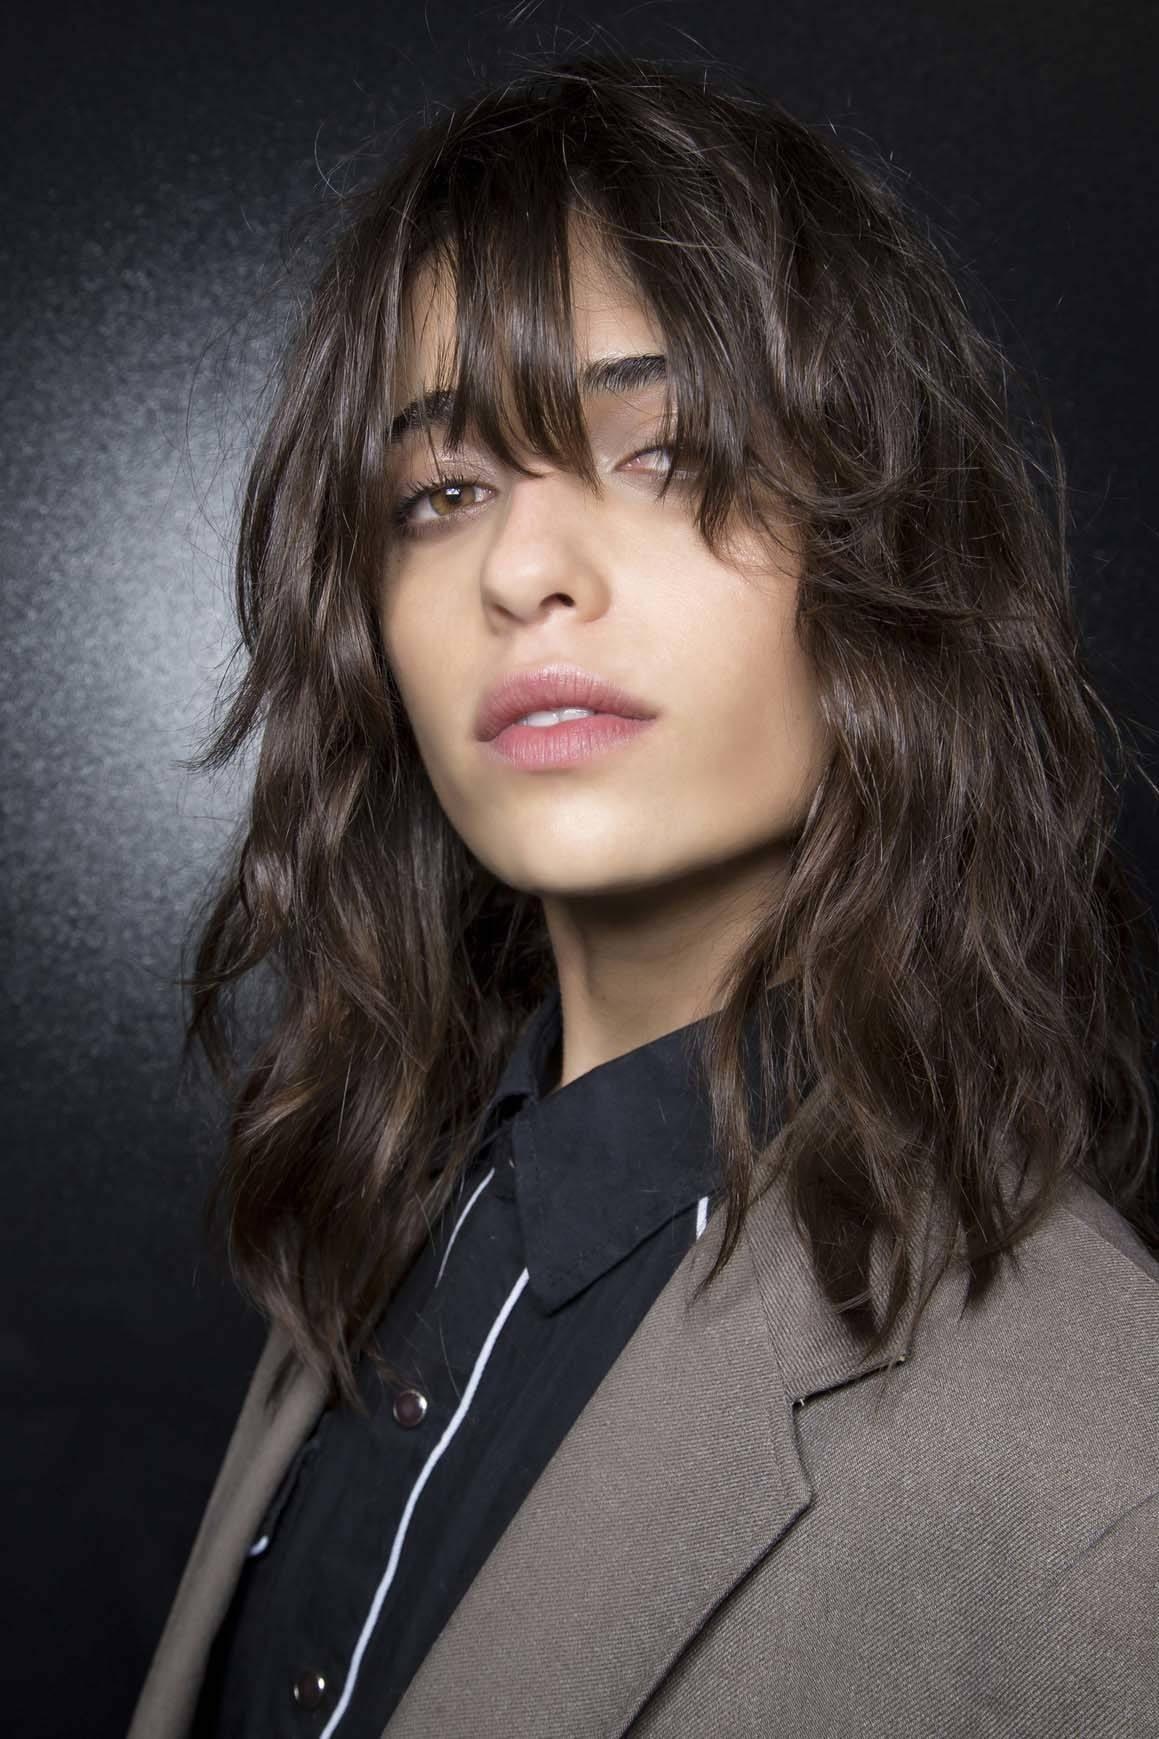 10 Model rambut shaggy panjang yang populer - All Things ...